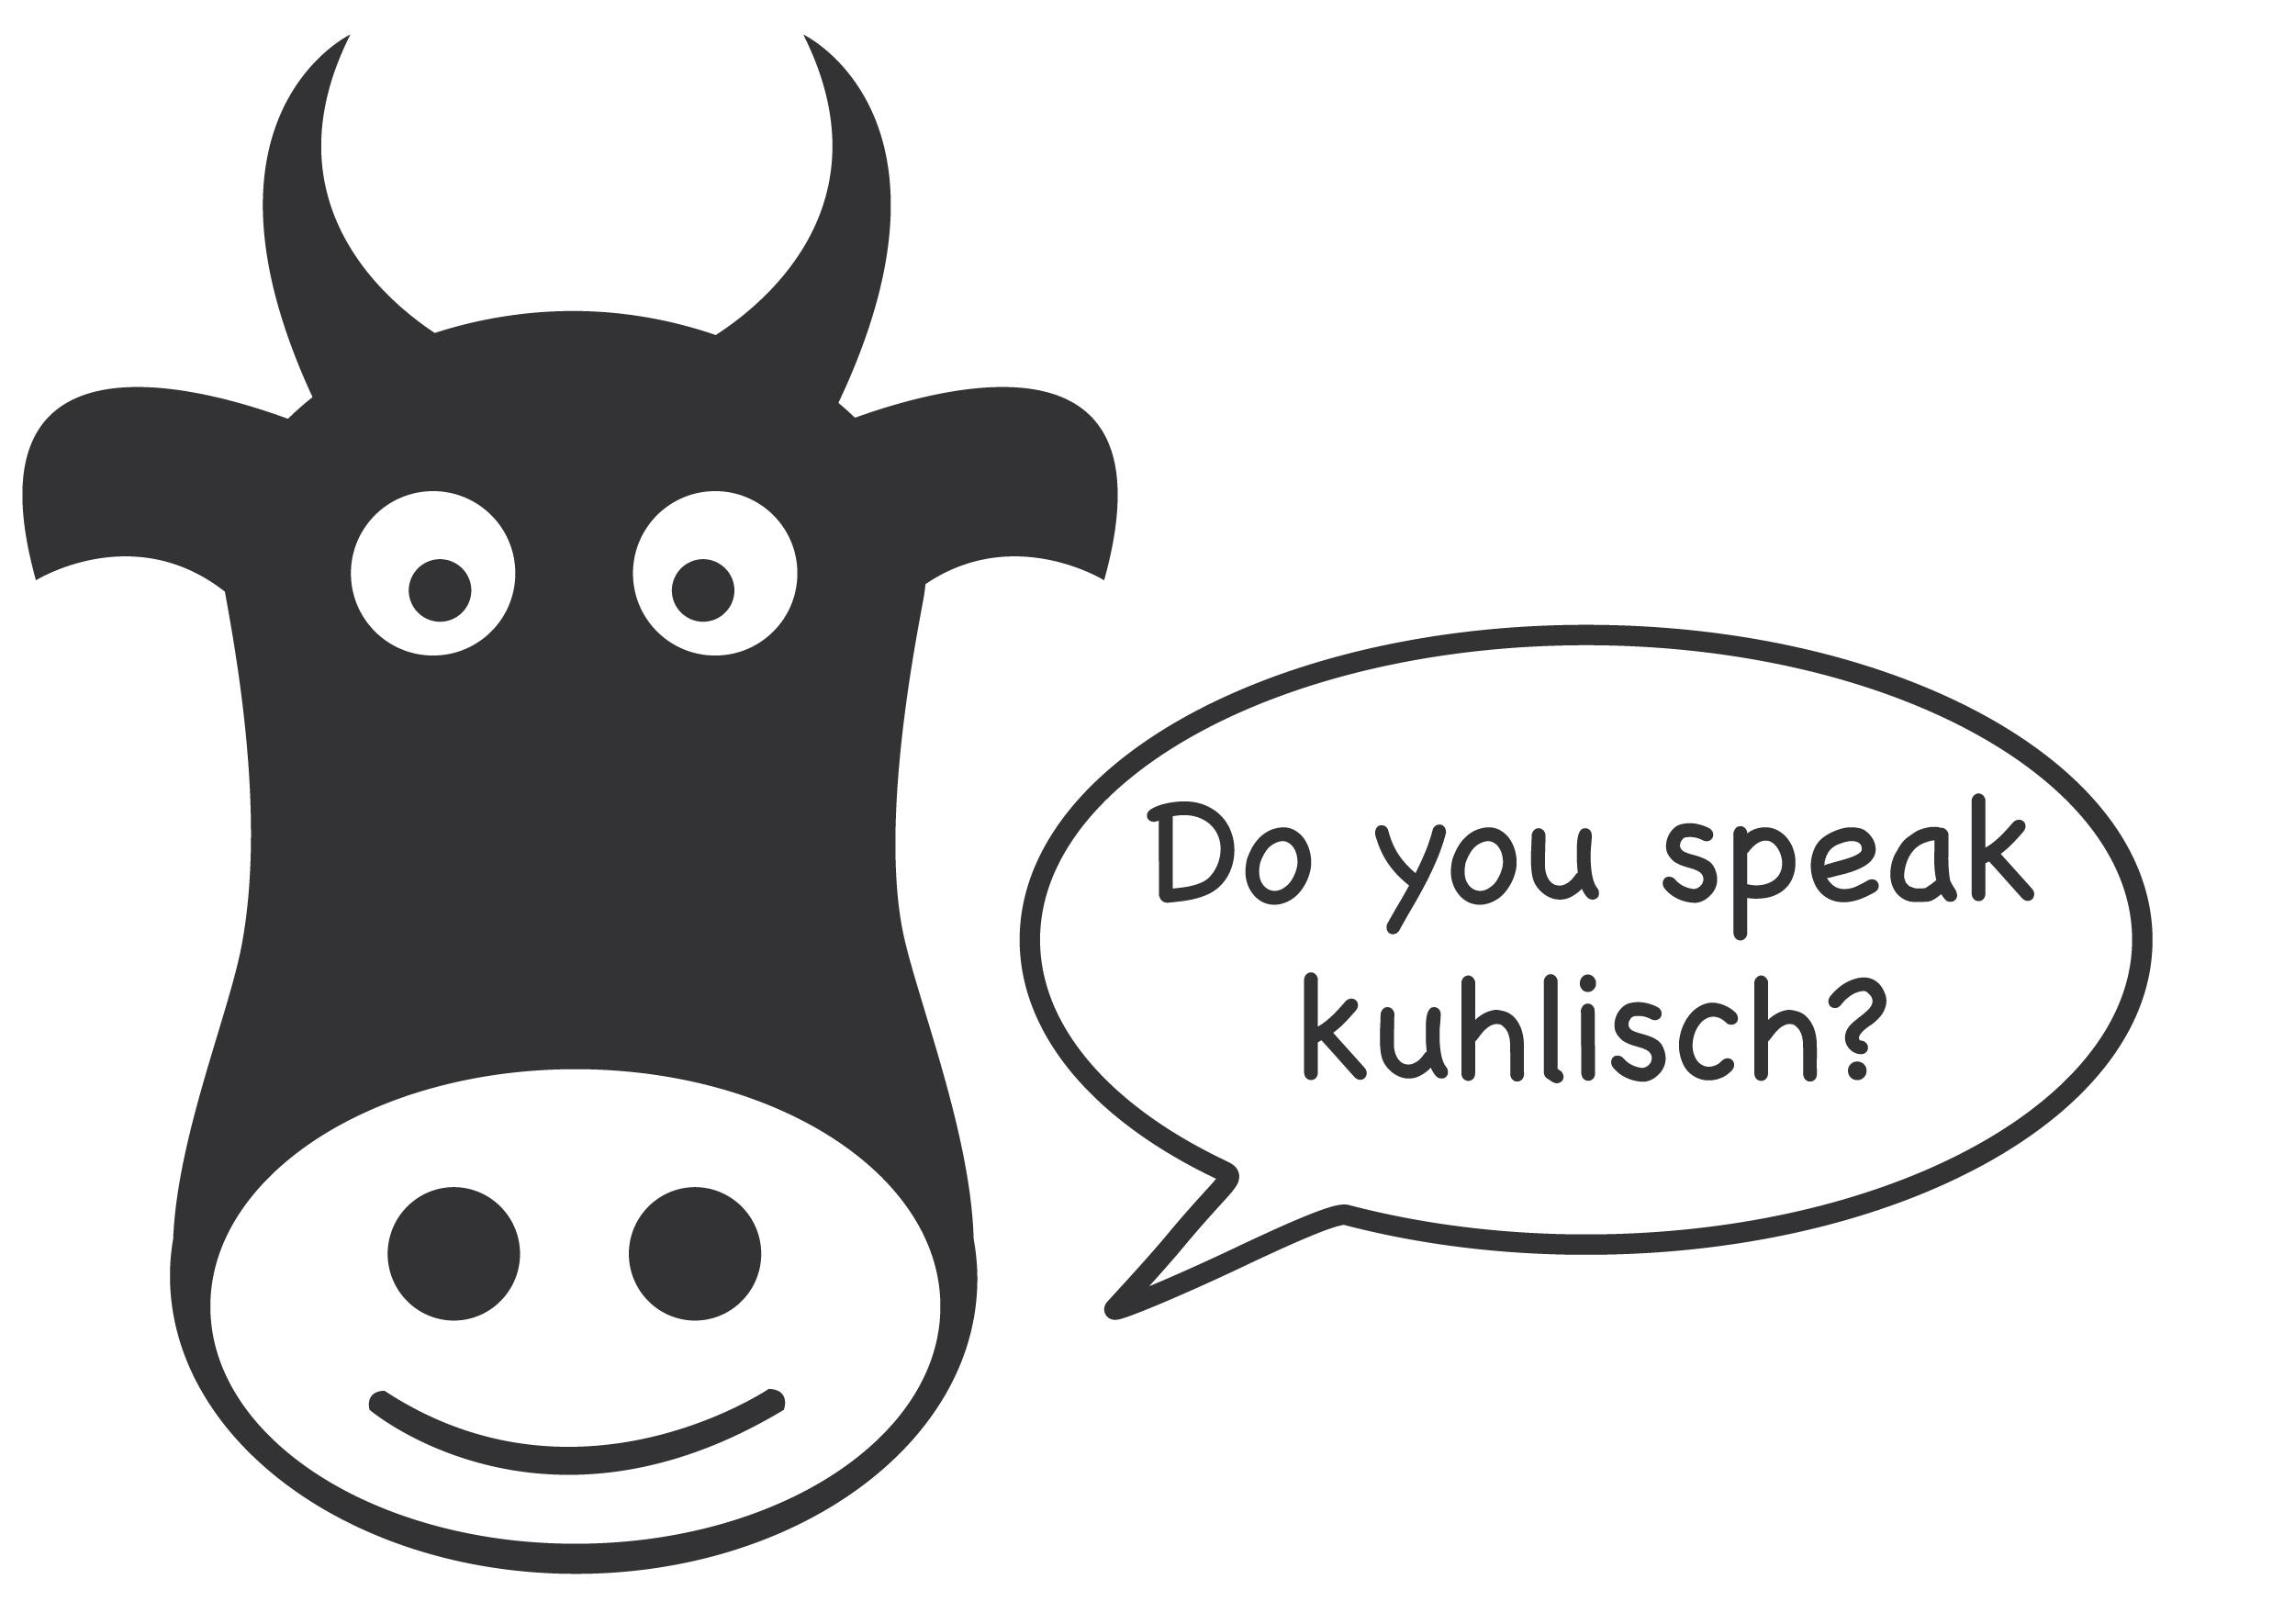 Wort-/Bildmarke: Do you speak kuhlisch?